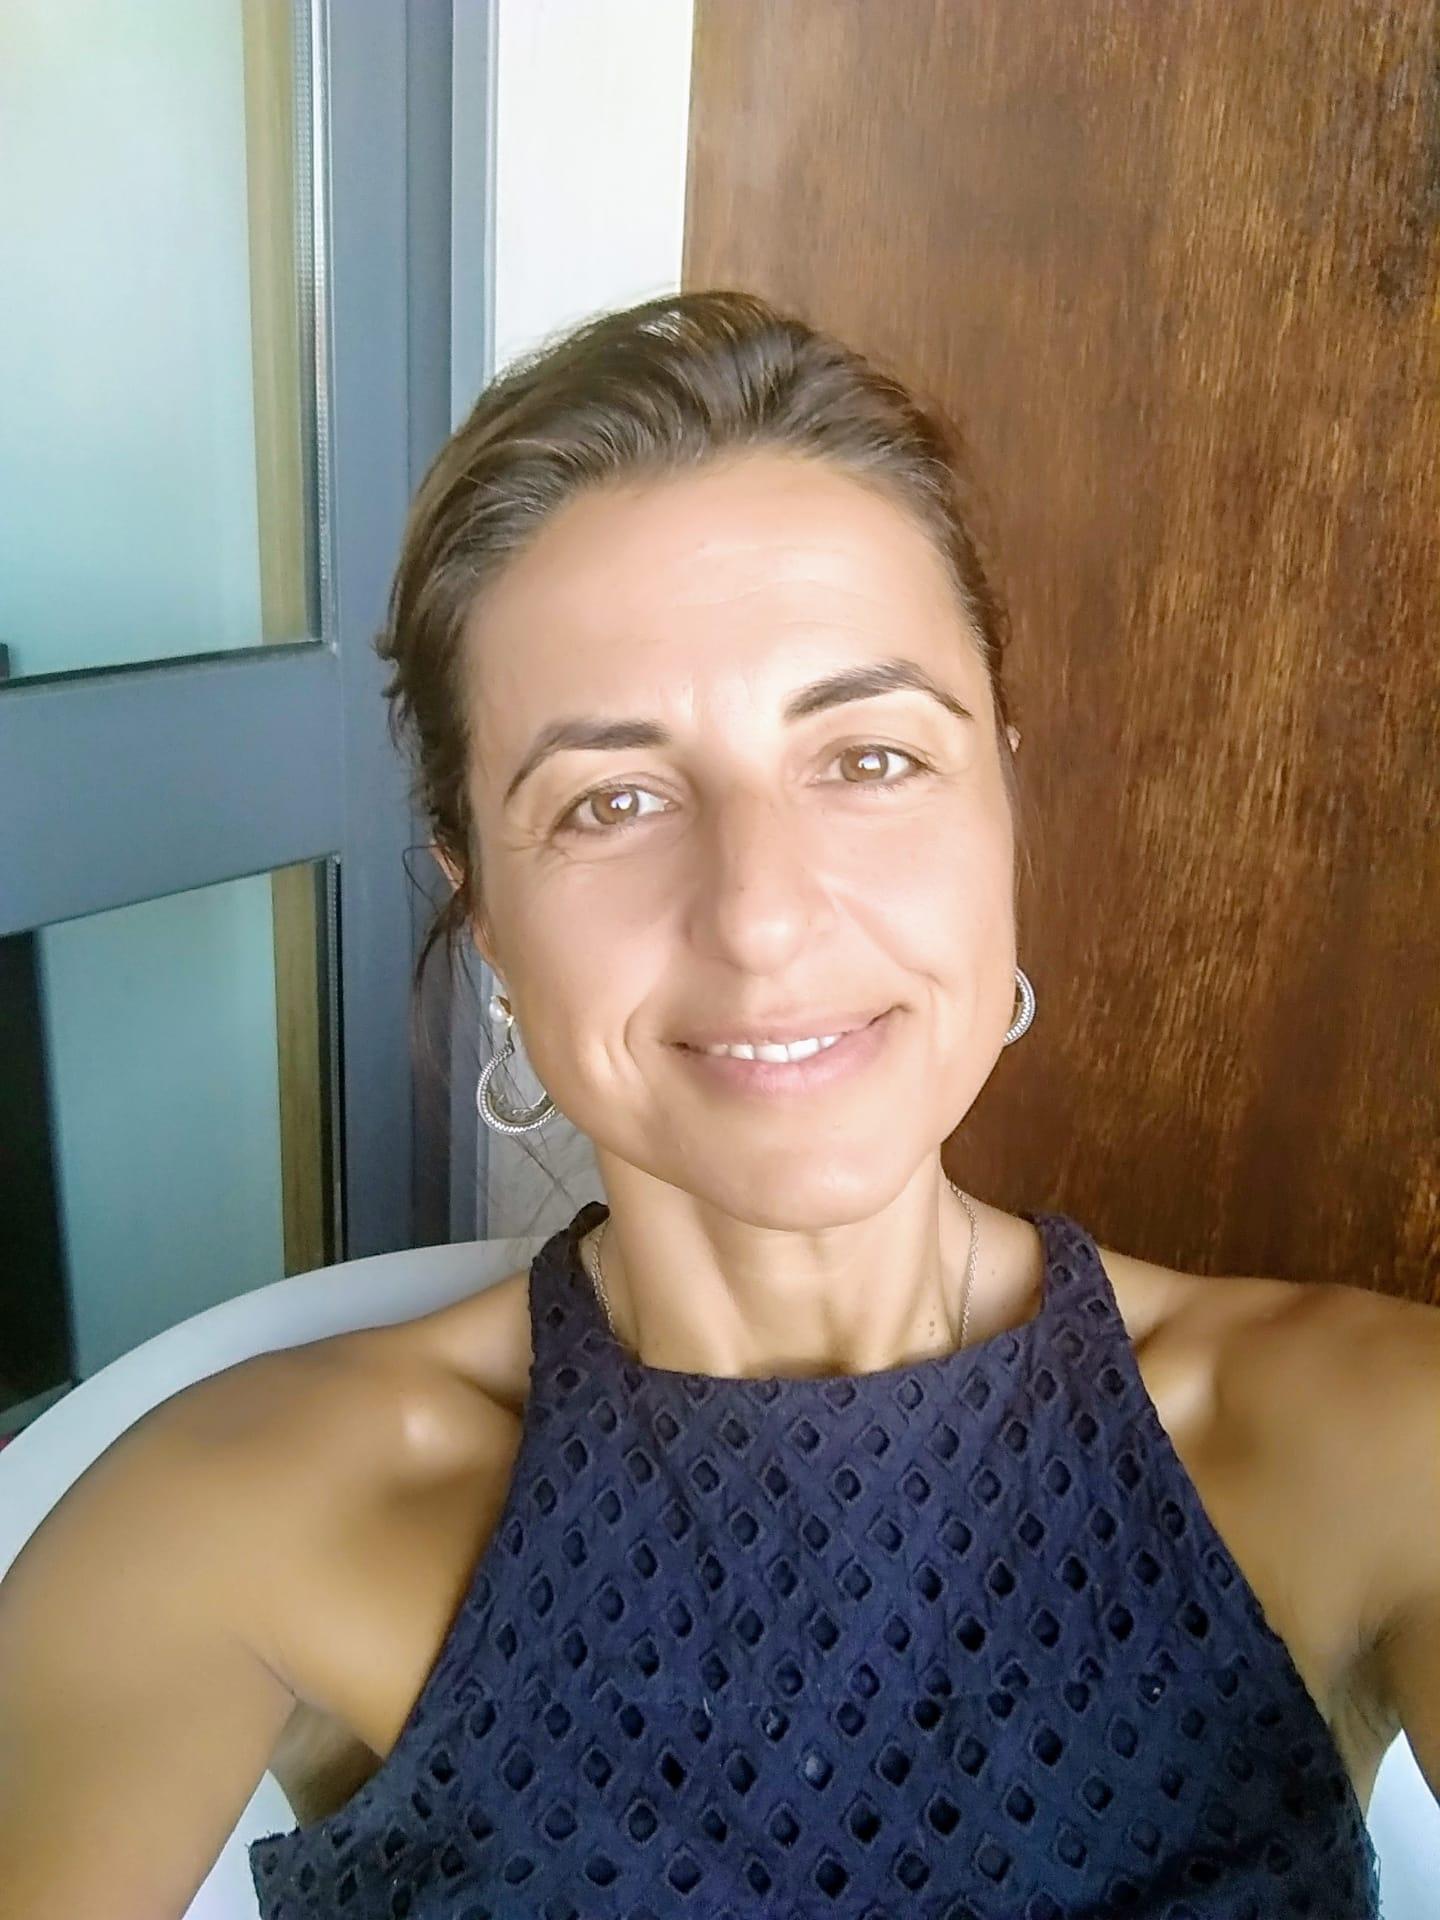 https://www.portaldastros.com/wp-content/uploads/2021/06/Rita-Barbosa.jpg